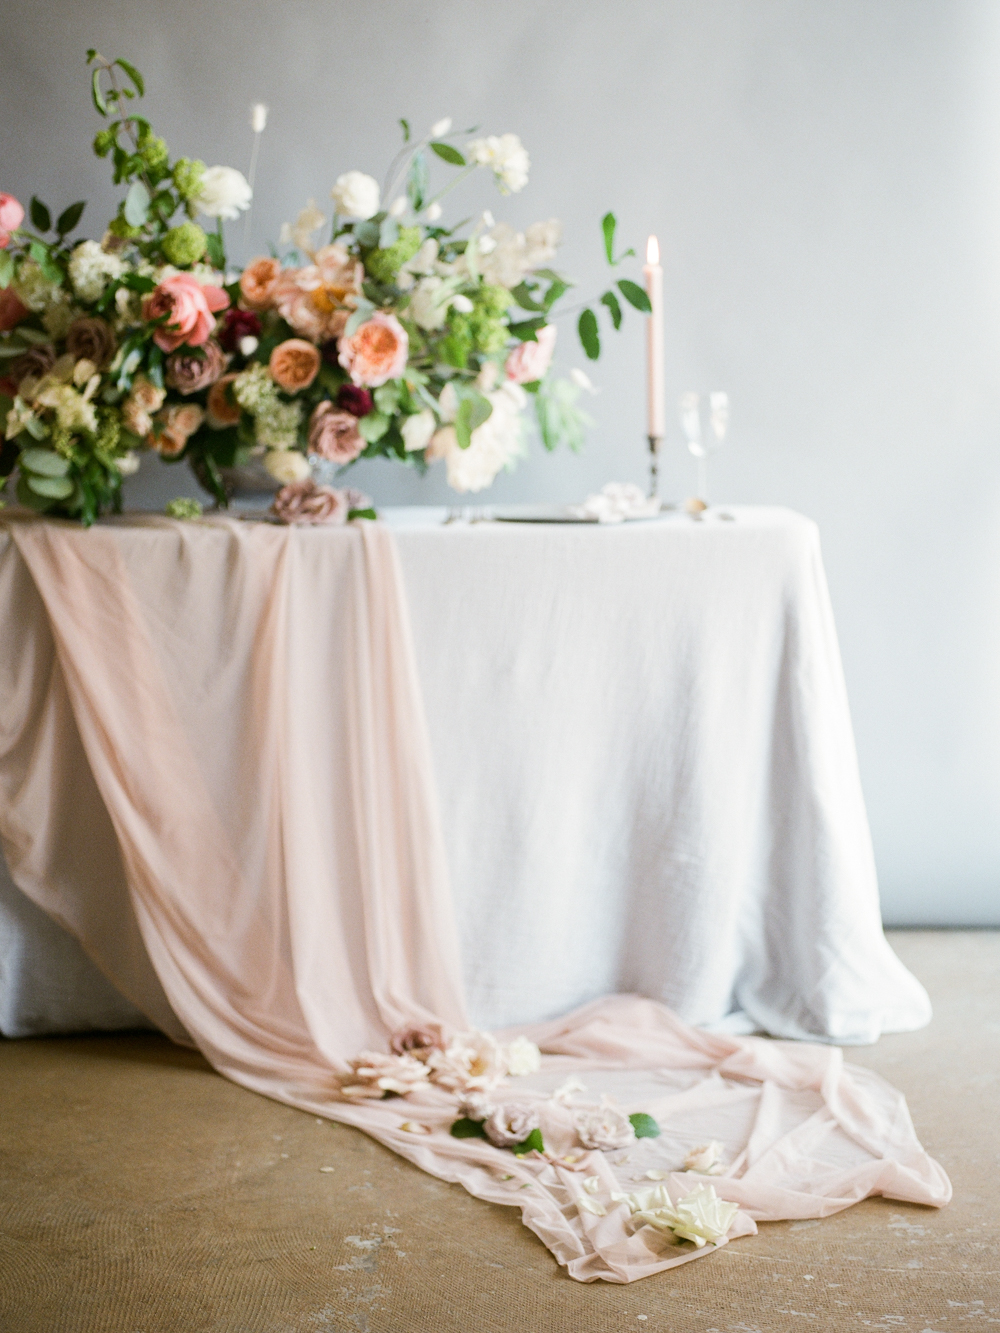 Christine Gosch - brand photographer - Maxit flower design - wedding florist-10.jpg